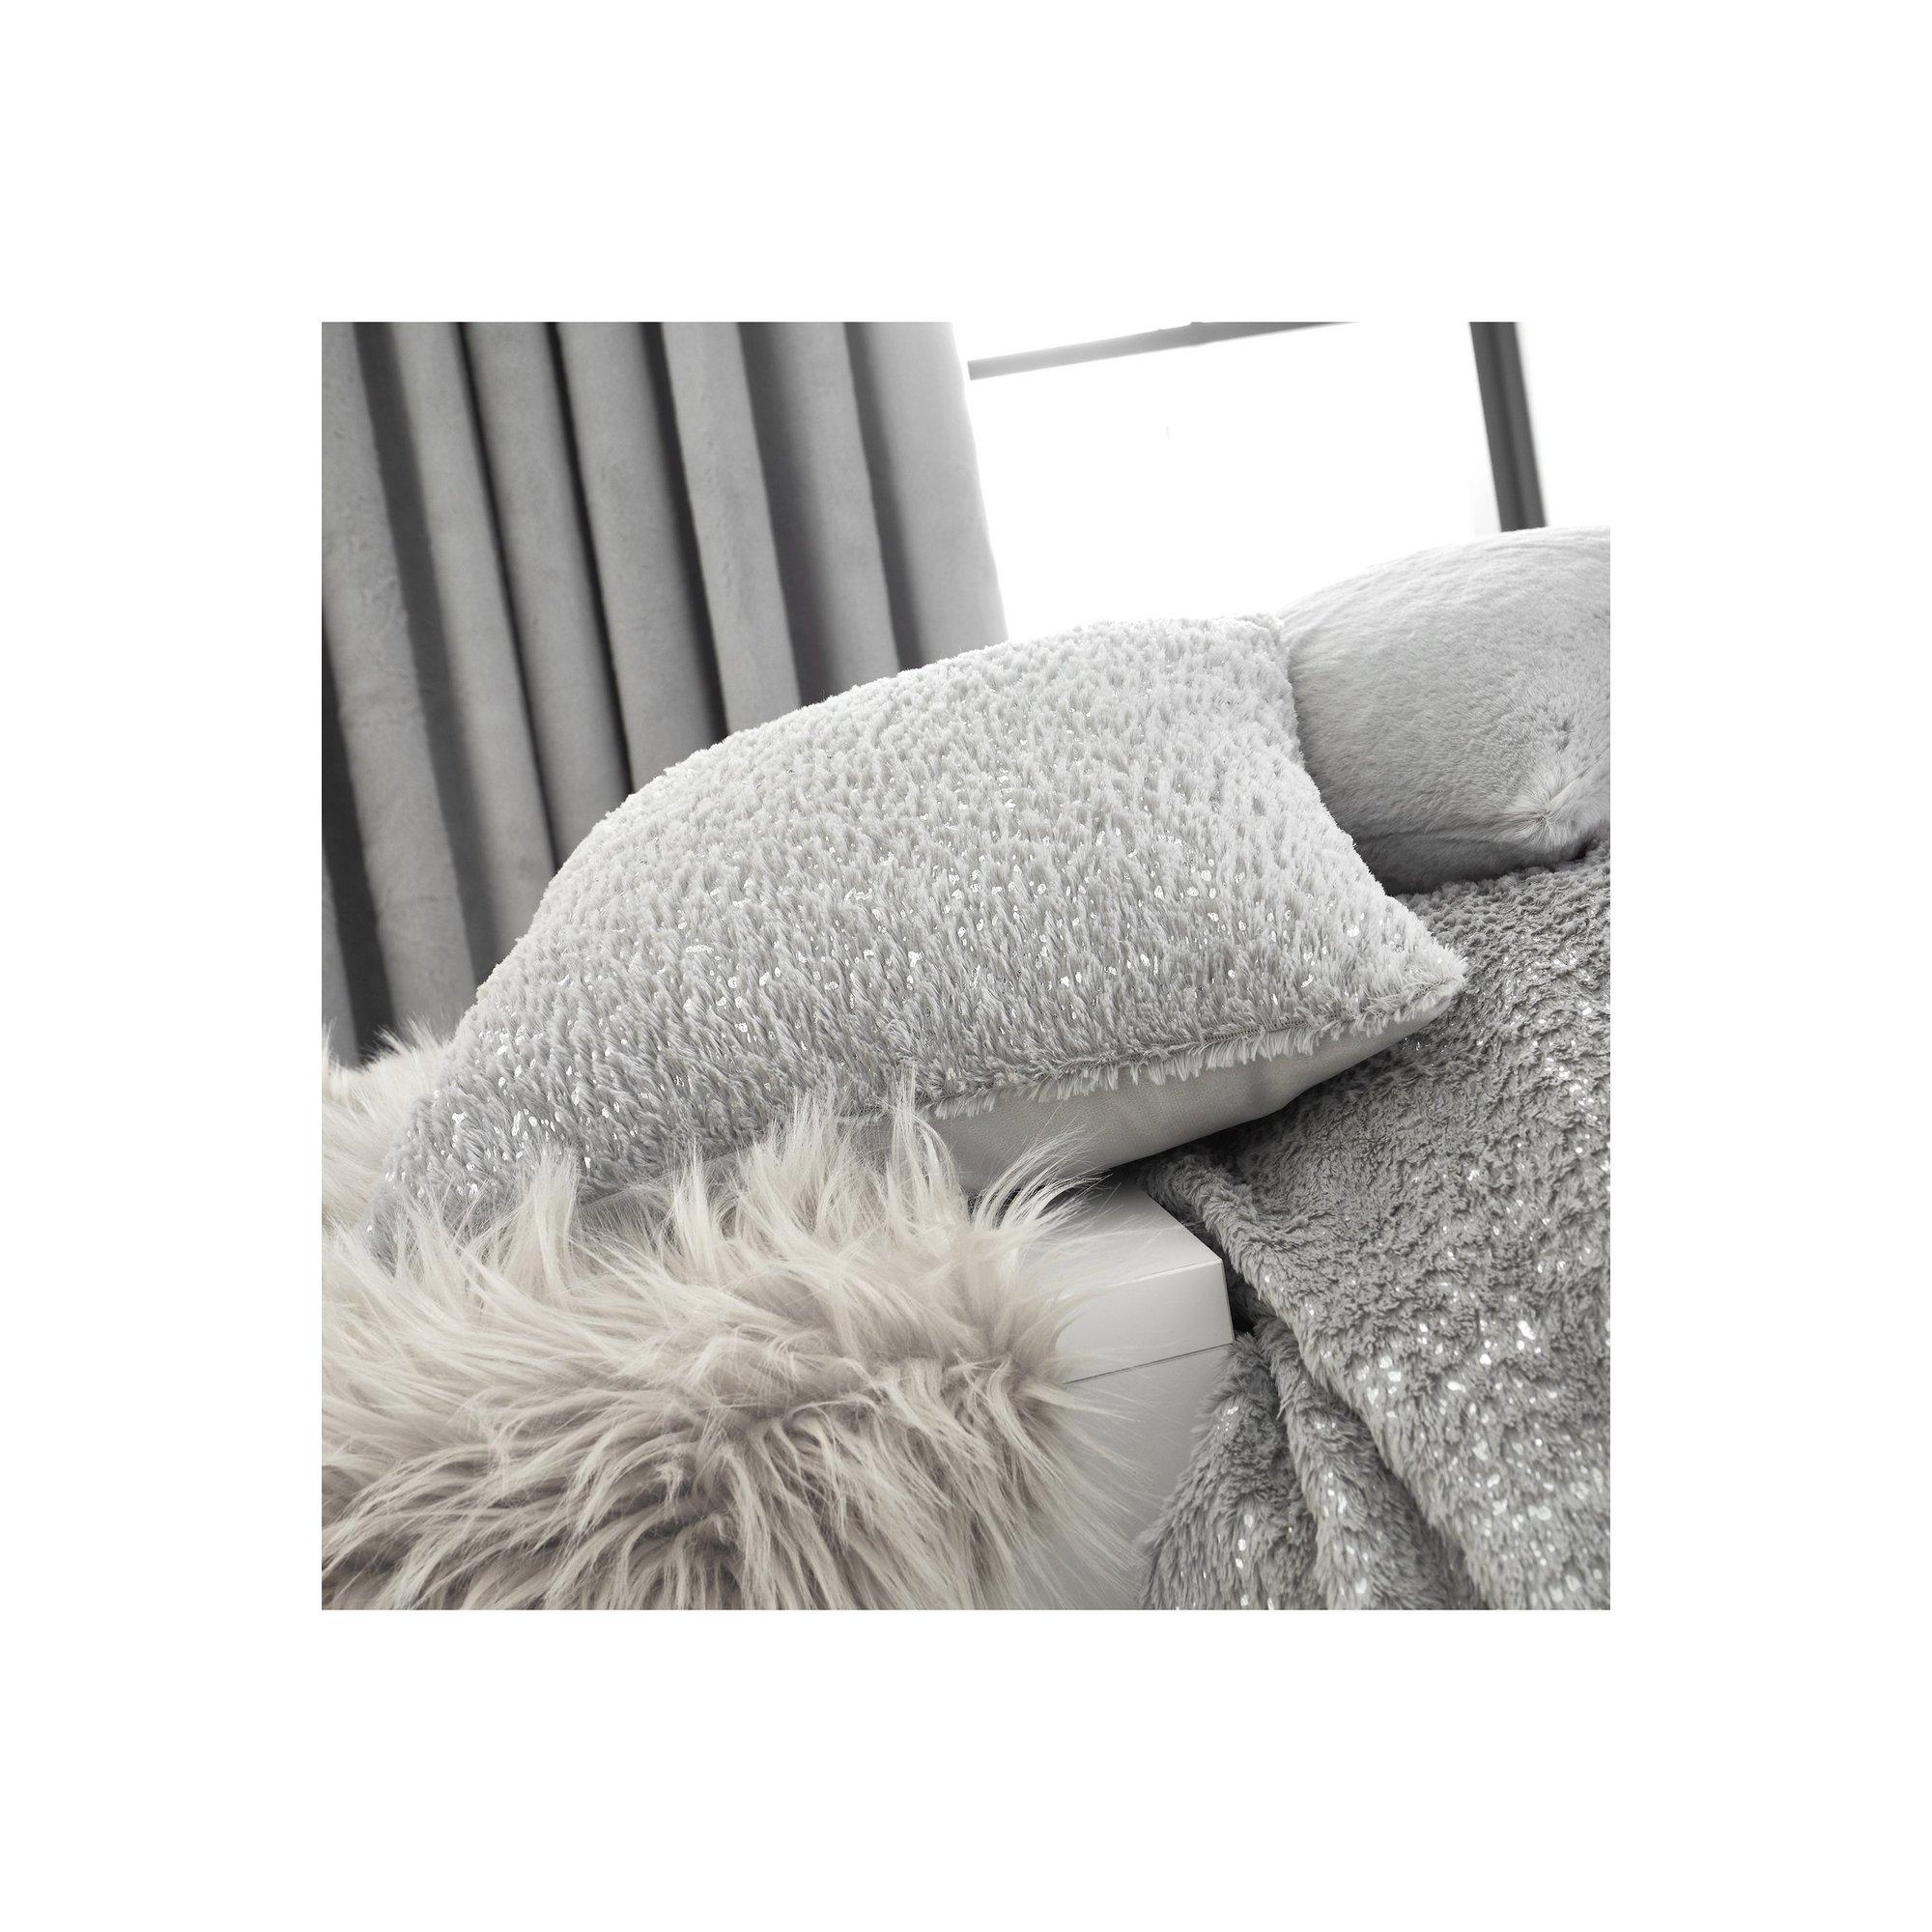 Image of Caprice Vivian Filled Cushion